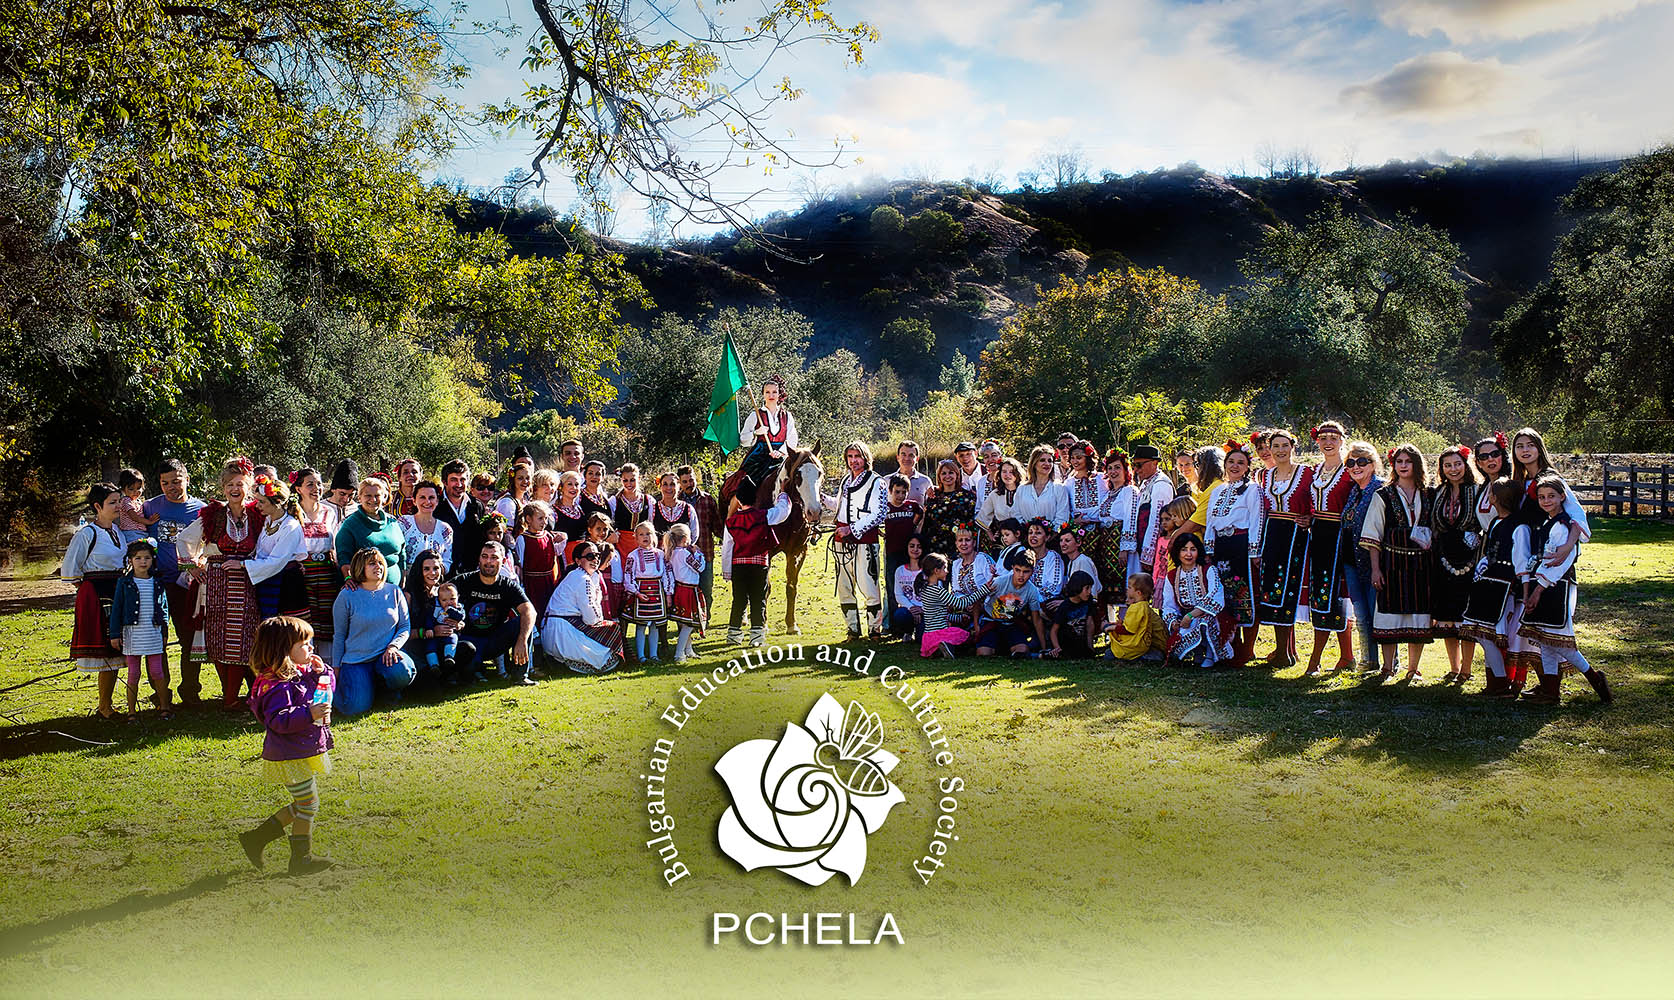 PCHELA-BULGARIAN_SOCIETY-US-0